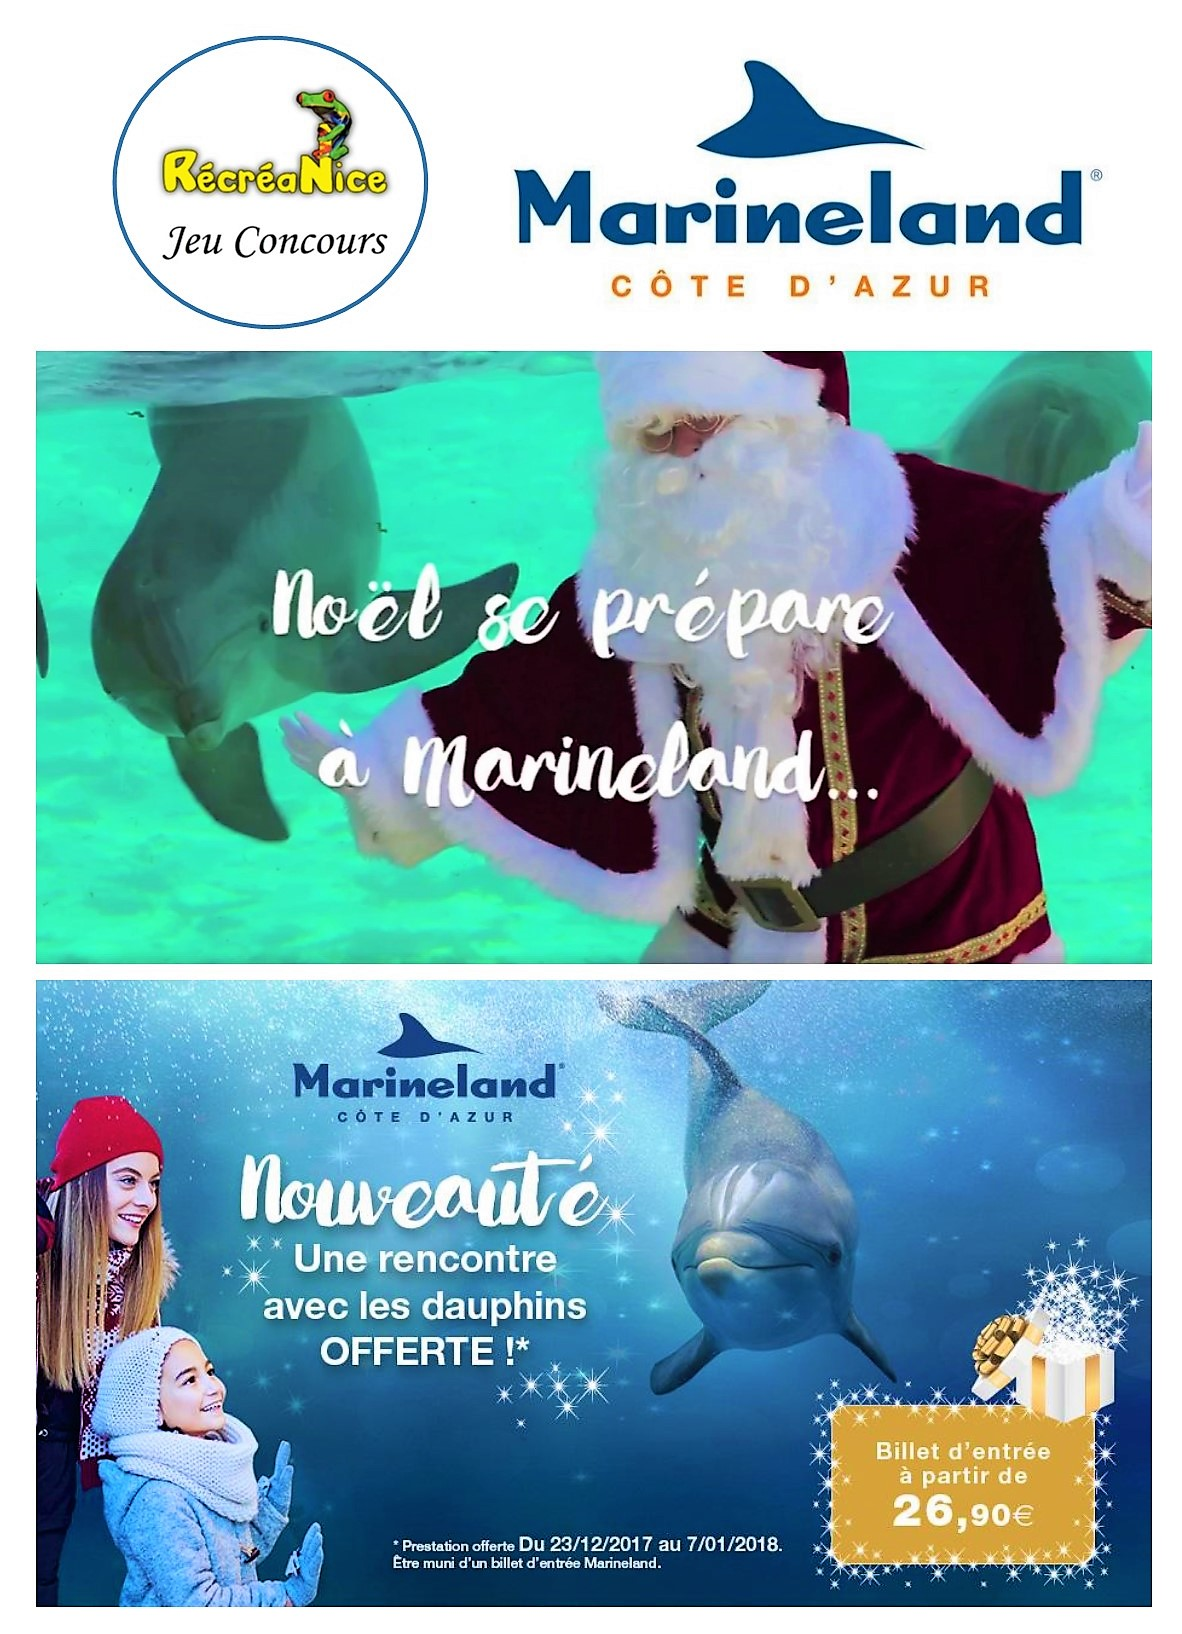 tarif rencontre avec les dauphins marineland